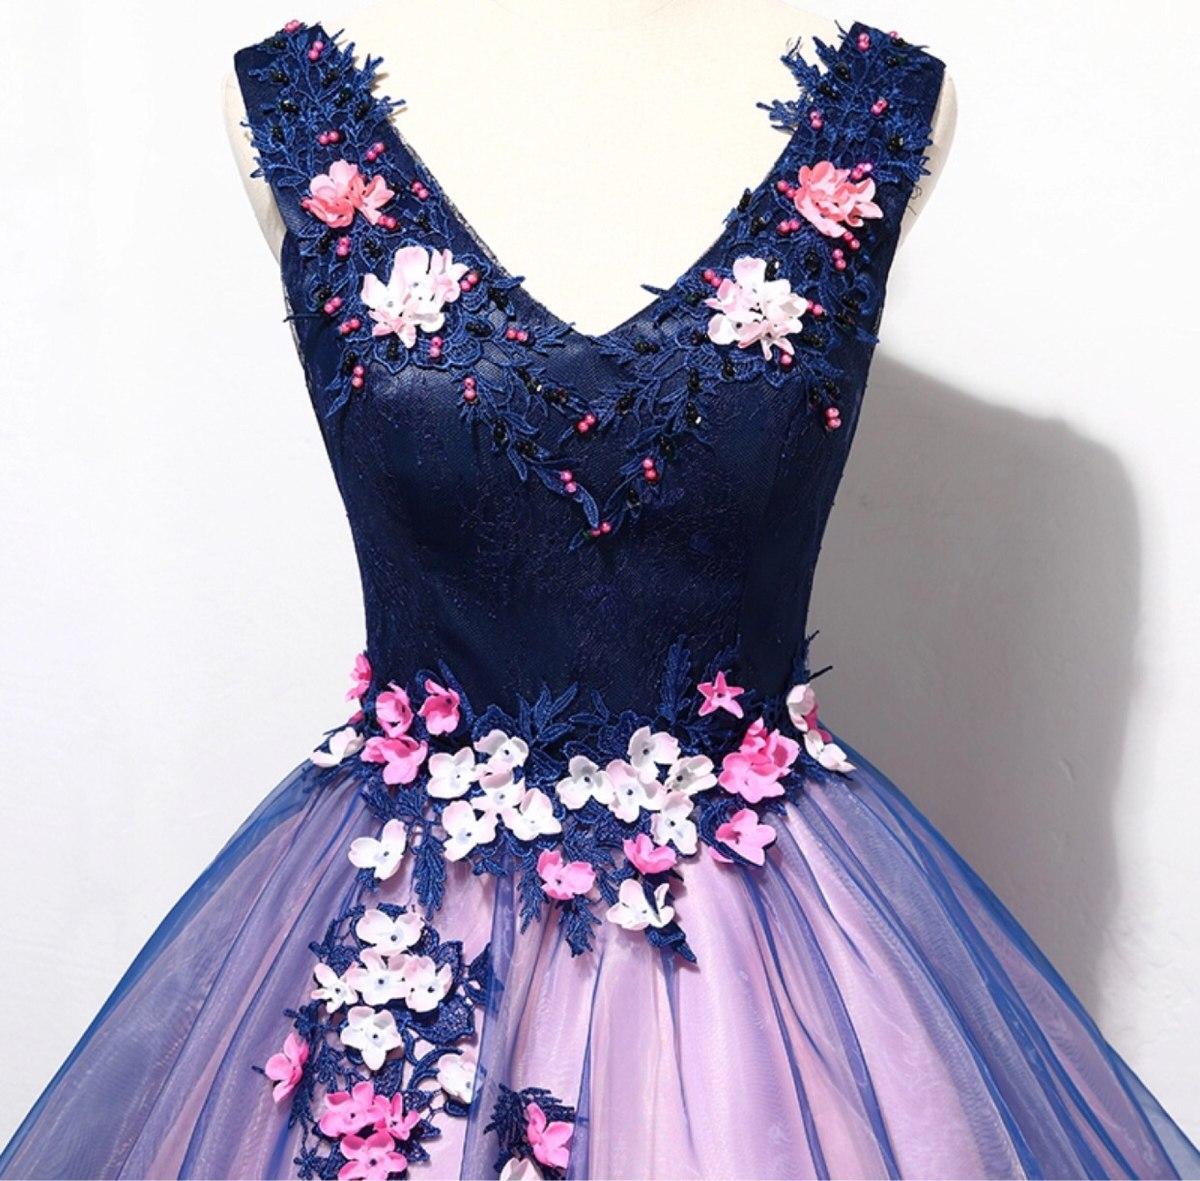 Vestido De Xv Anos 15 Dulces 16 Flores Bordado Rosas Azul